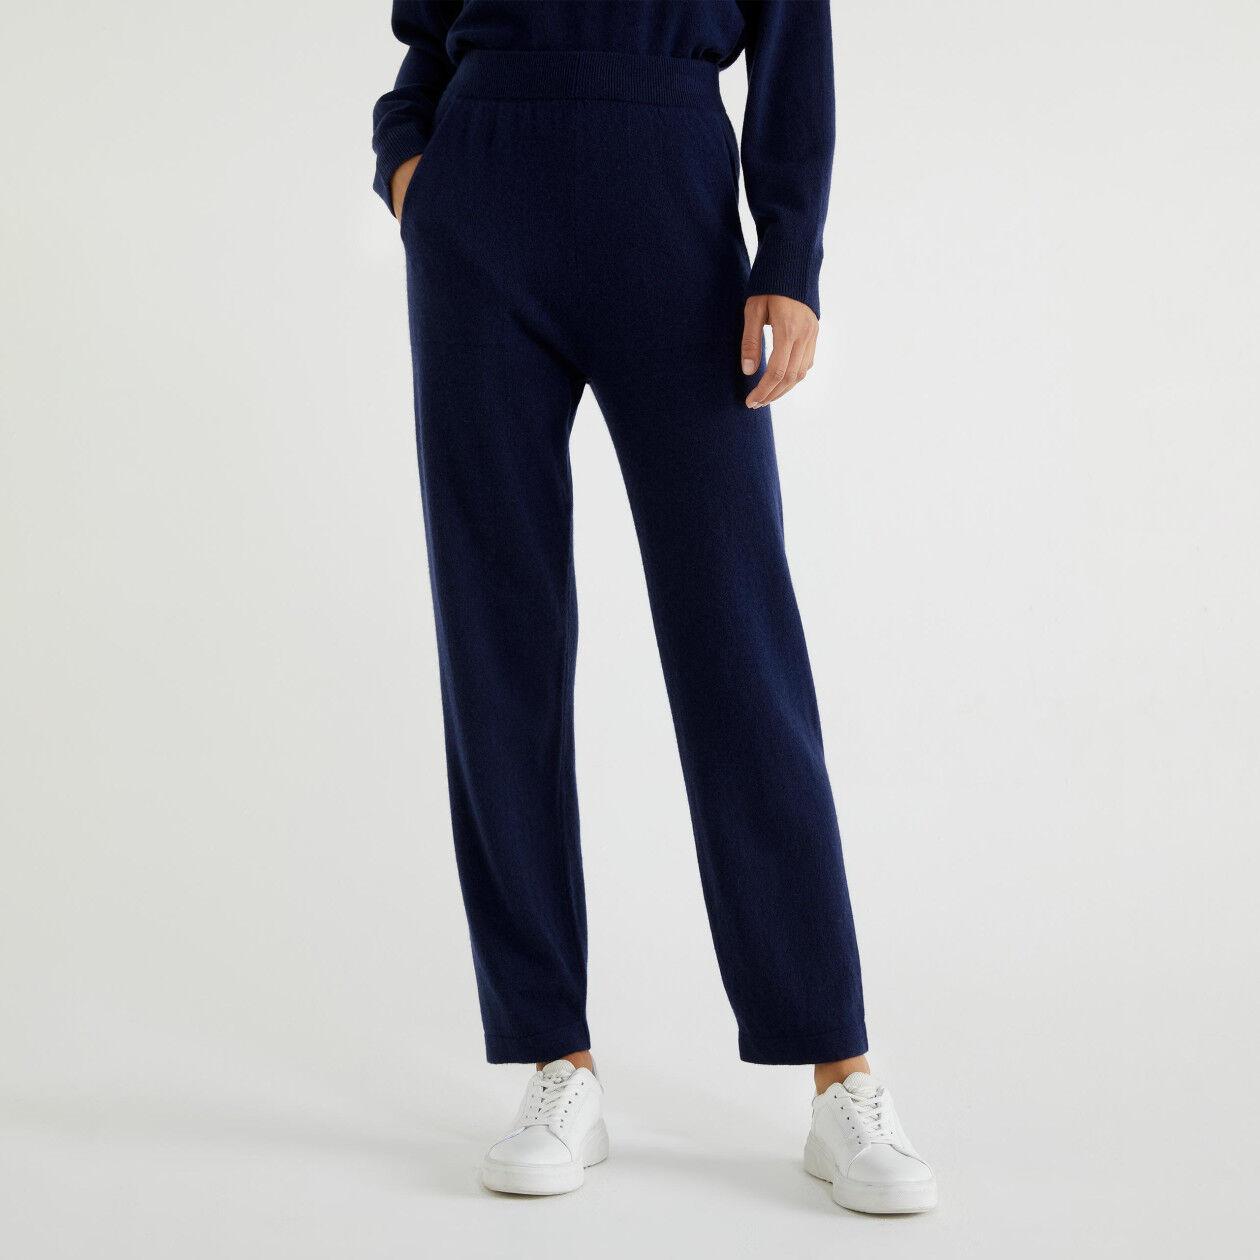 Pantaloni in cashmere e lana vergine